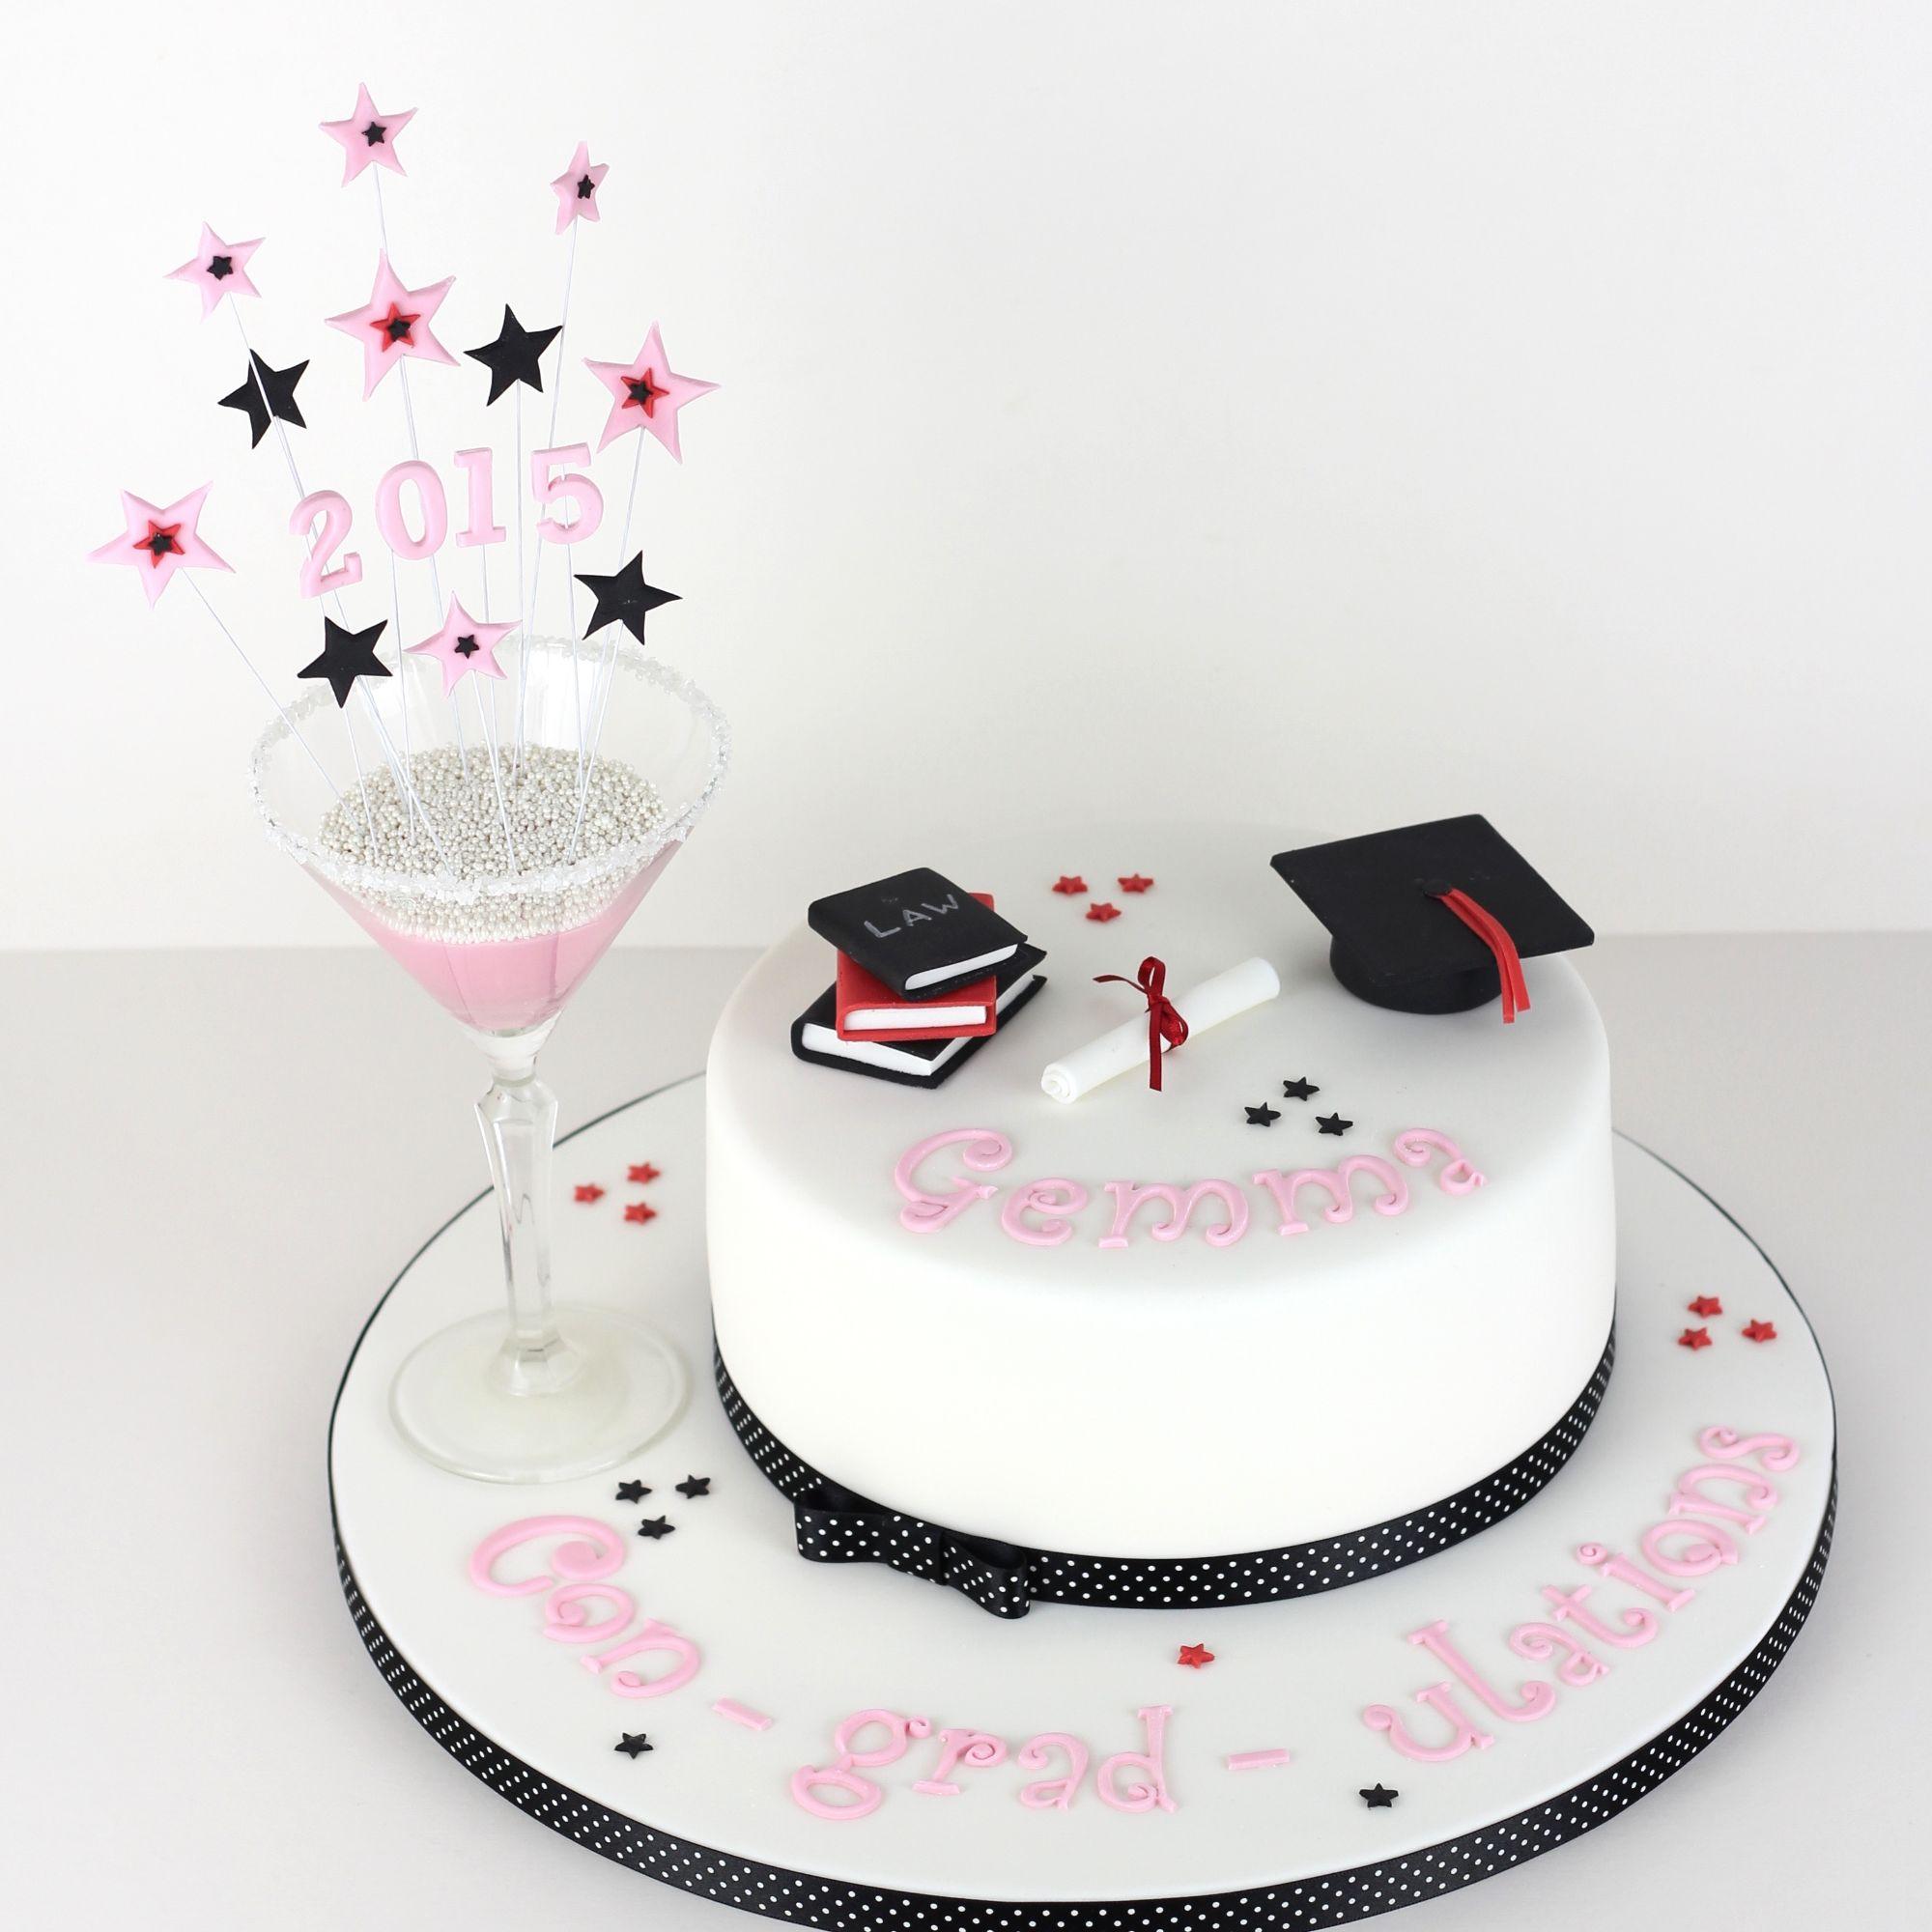 Gruduation cake